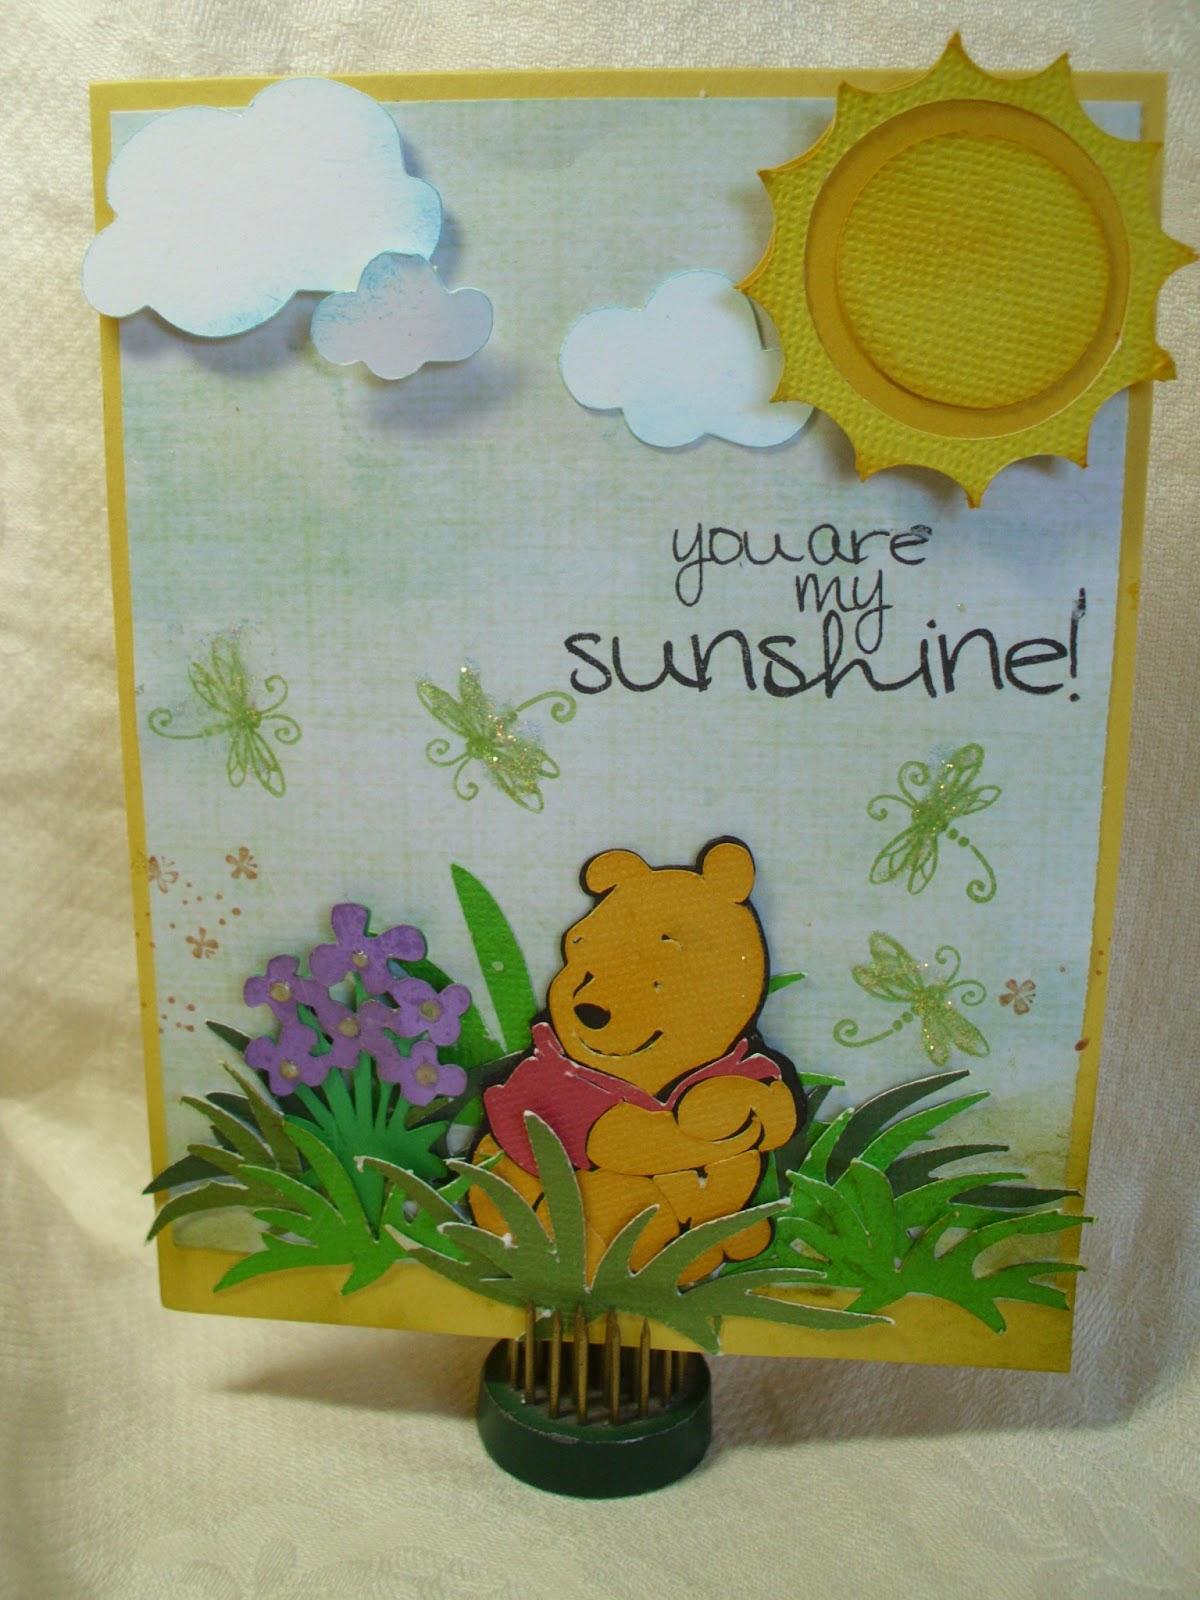 Shellys Craft Blog: Fun In The Sun At My Cricut Craft Room